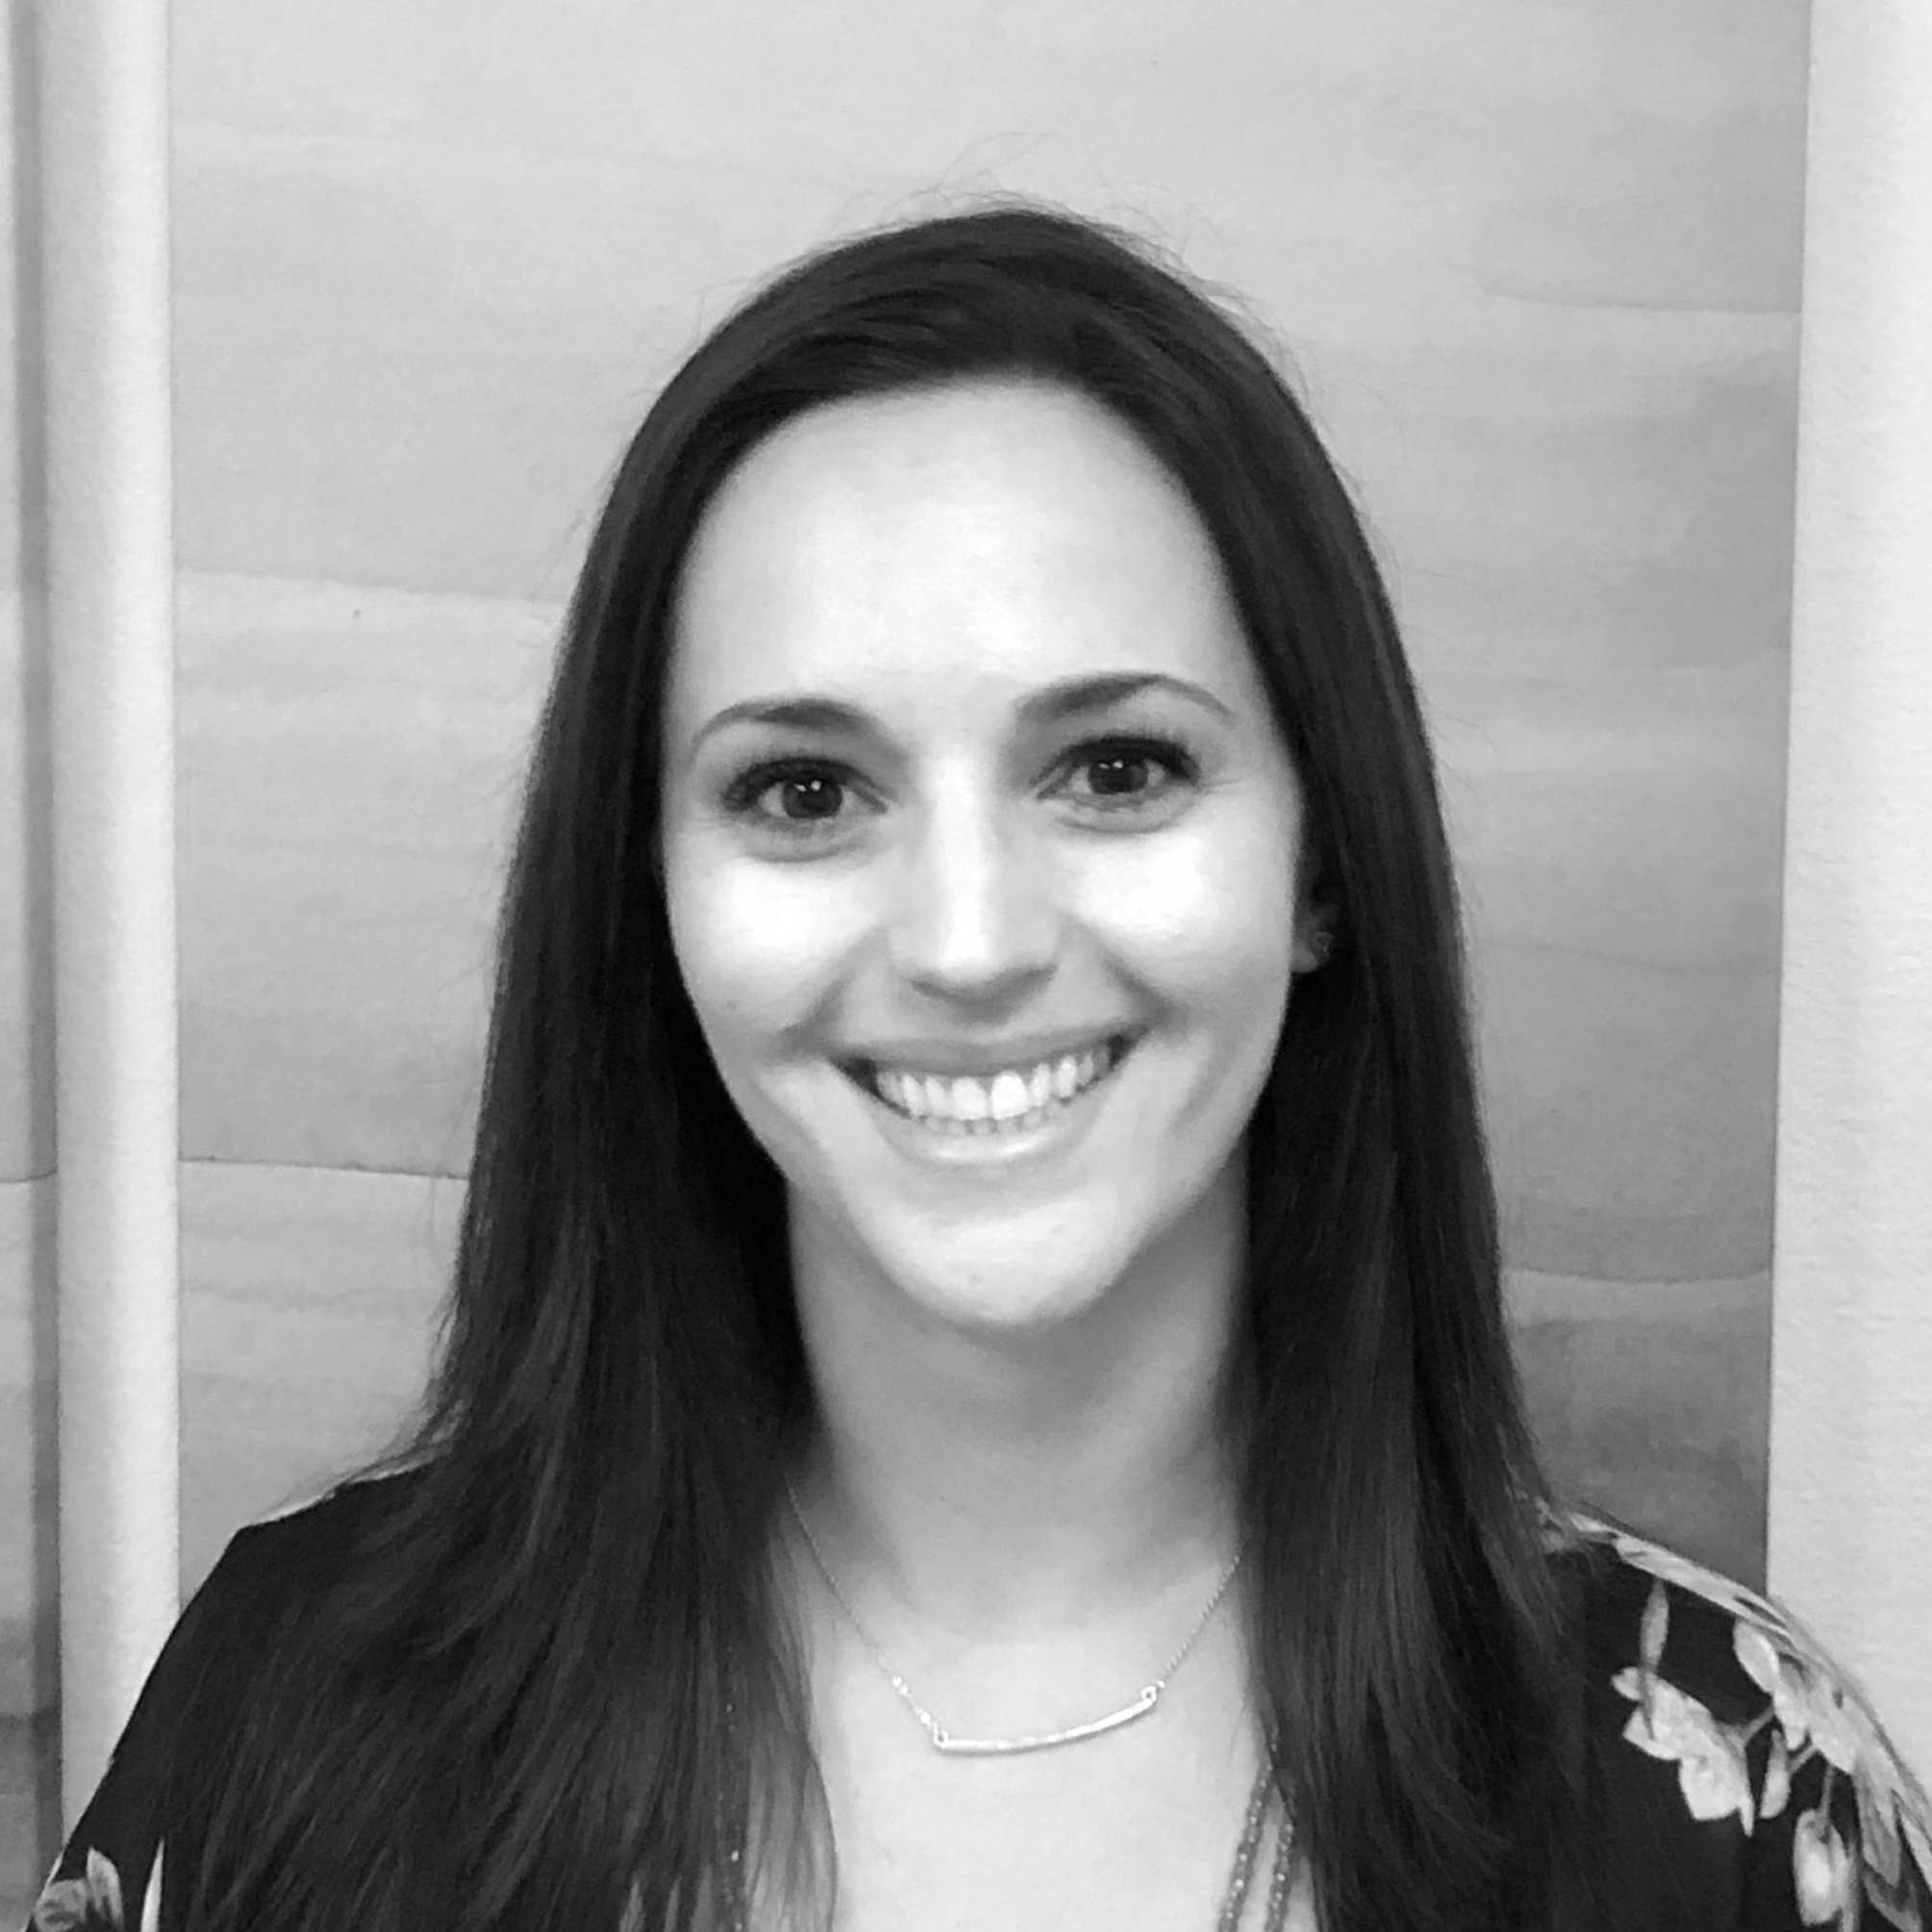 Emily Barrack - V.P. Finance & Administration